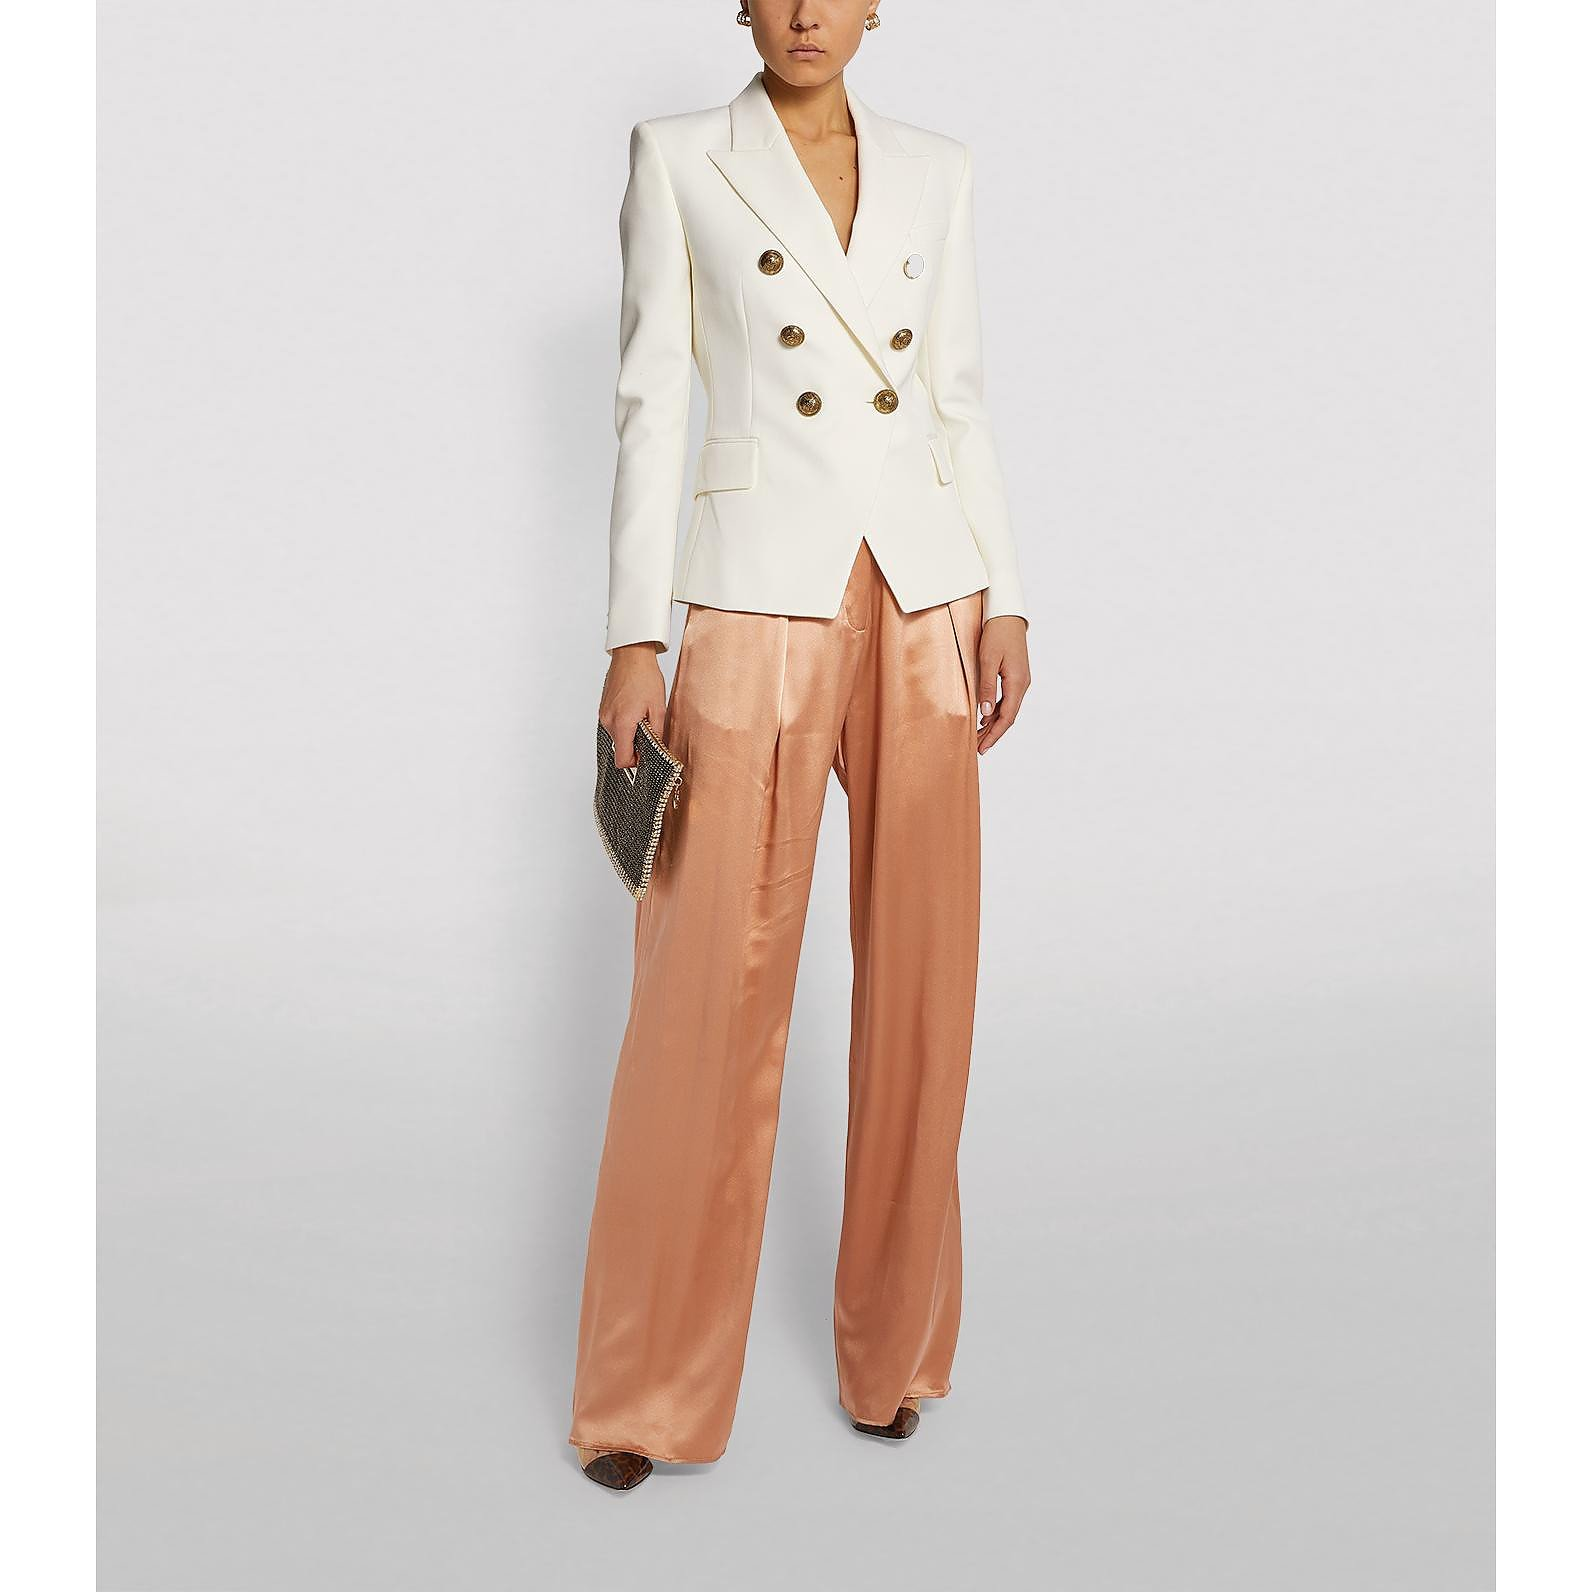 Michael Lo Sordo Silk Trousers